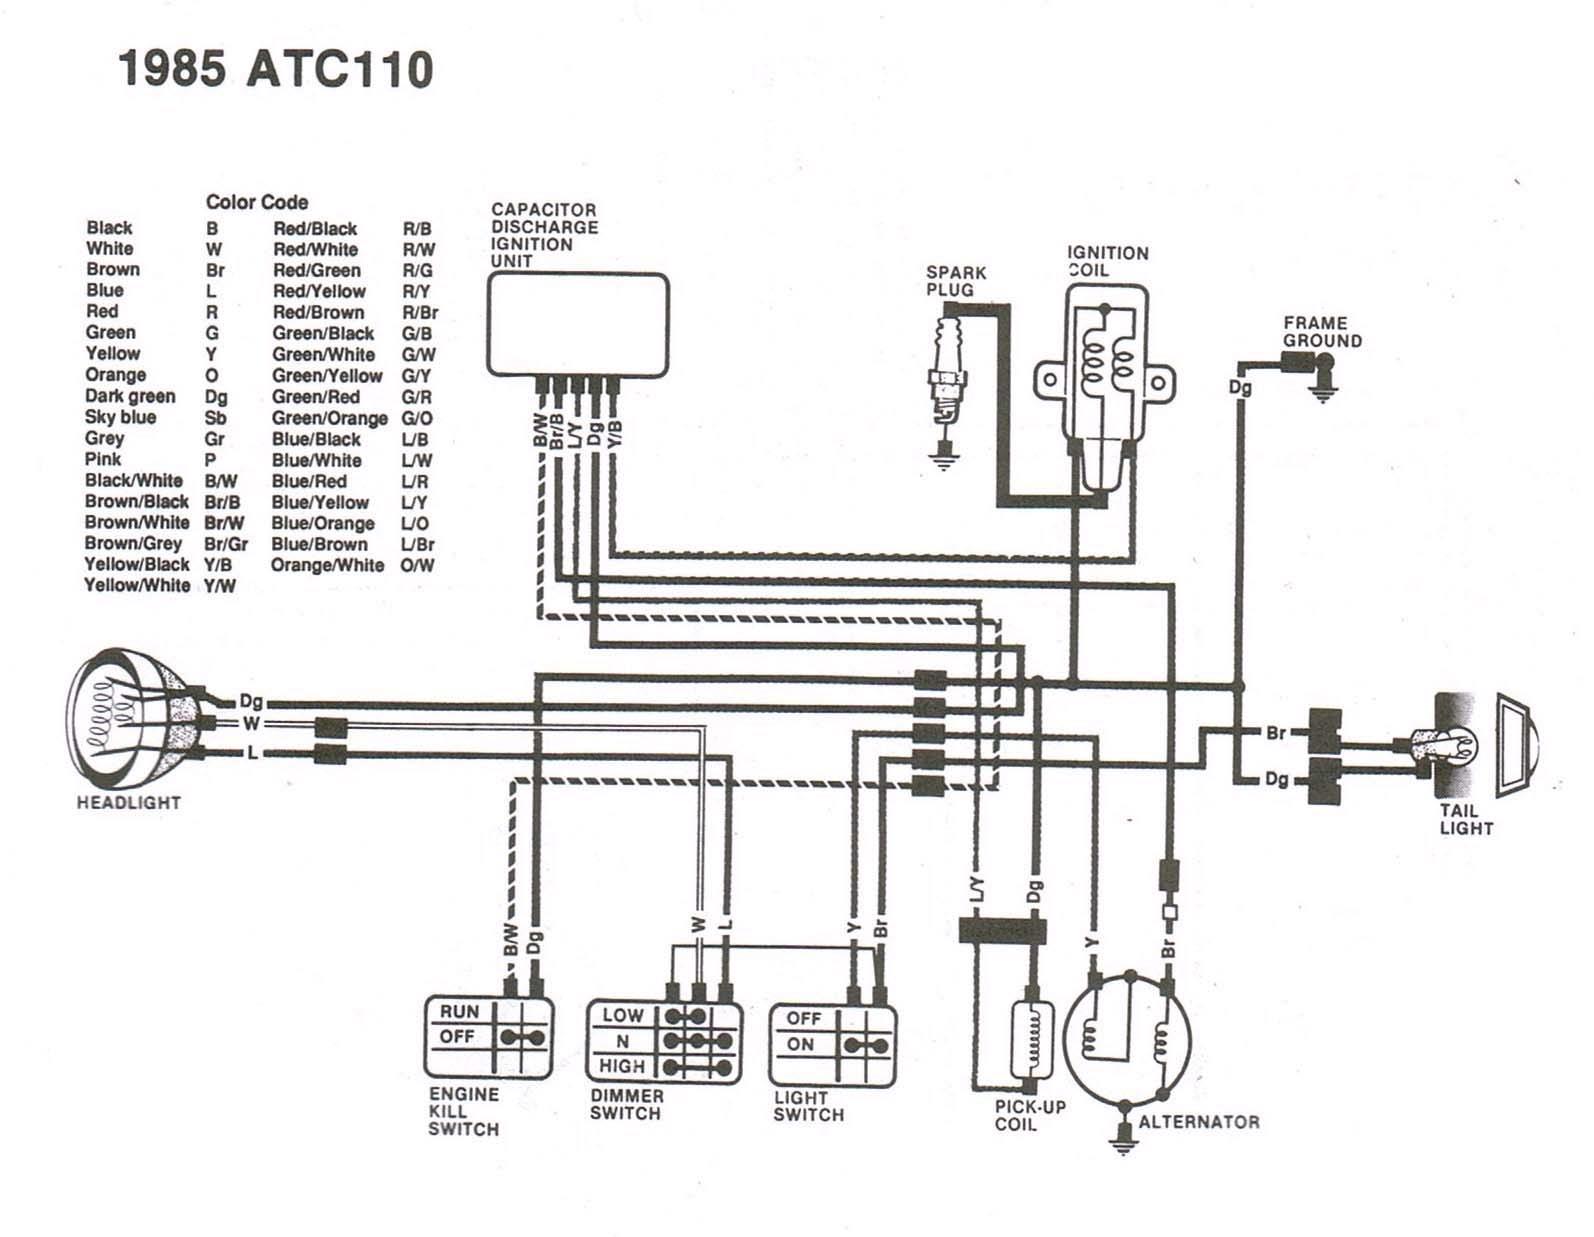 1973 Honda St90 Wiring Diagram